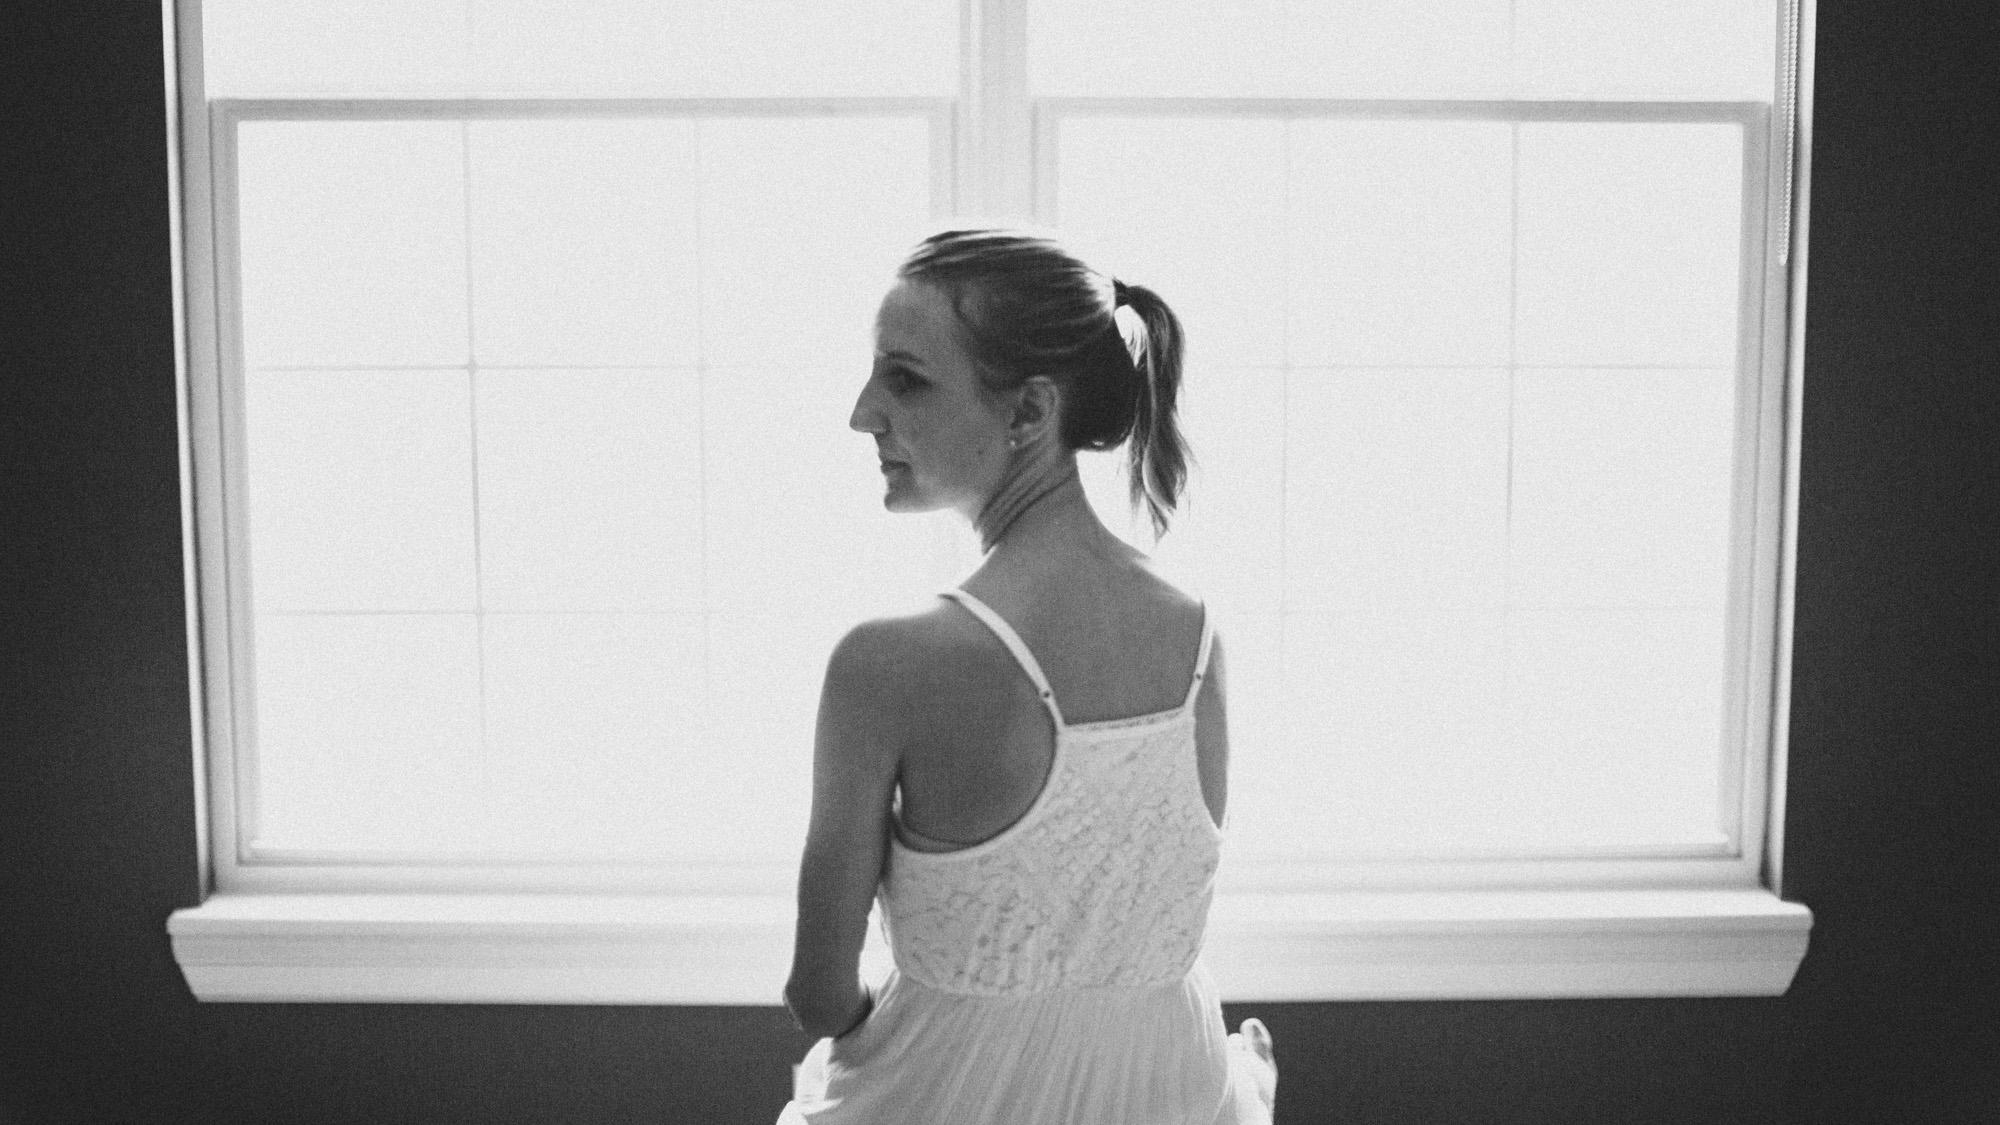 alec_vanderboom_springfield_missouri_wedding-0027.jpg